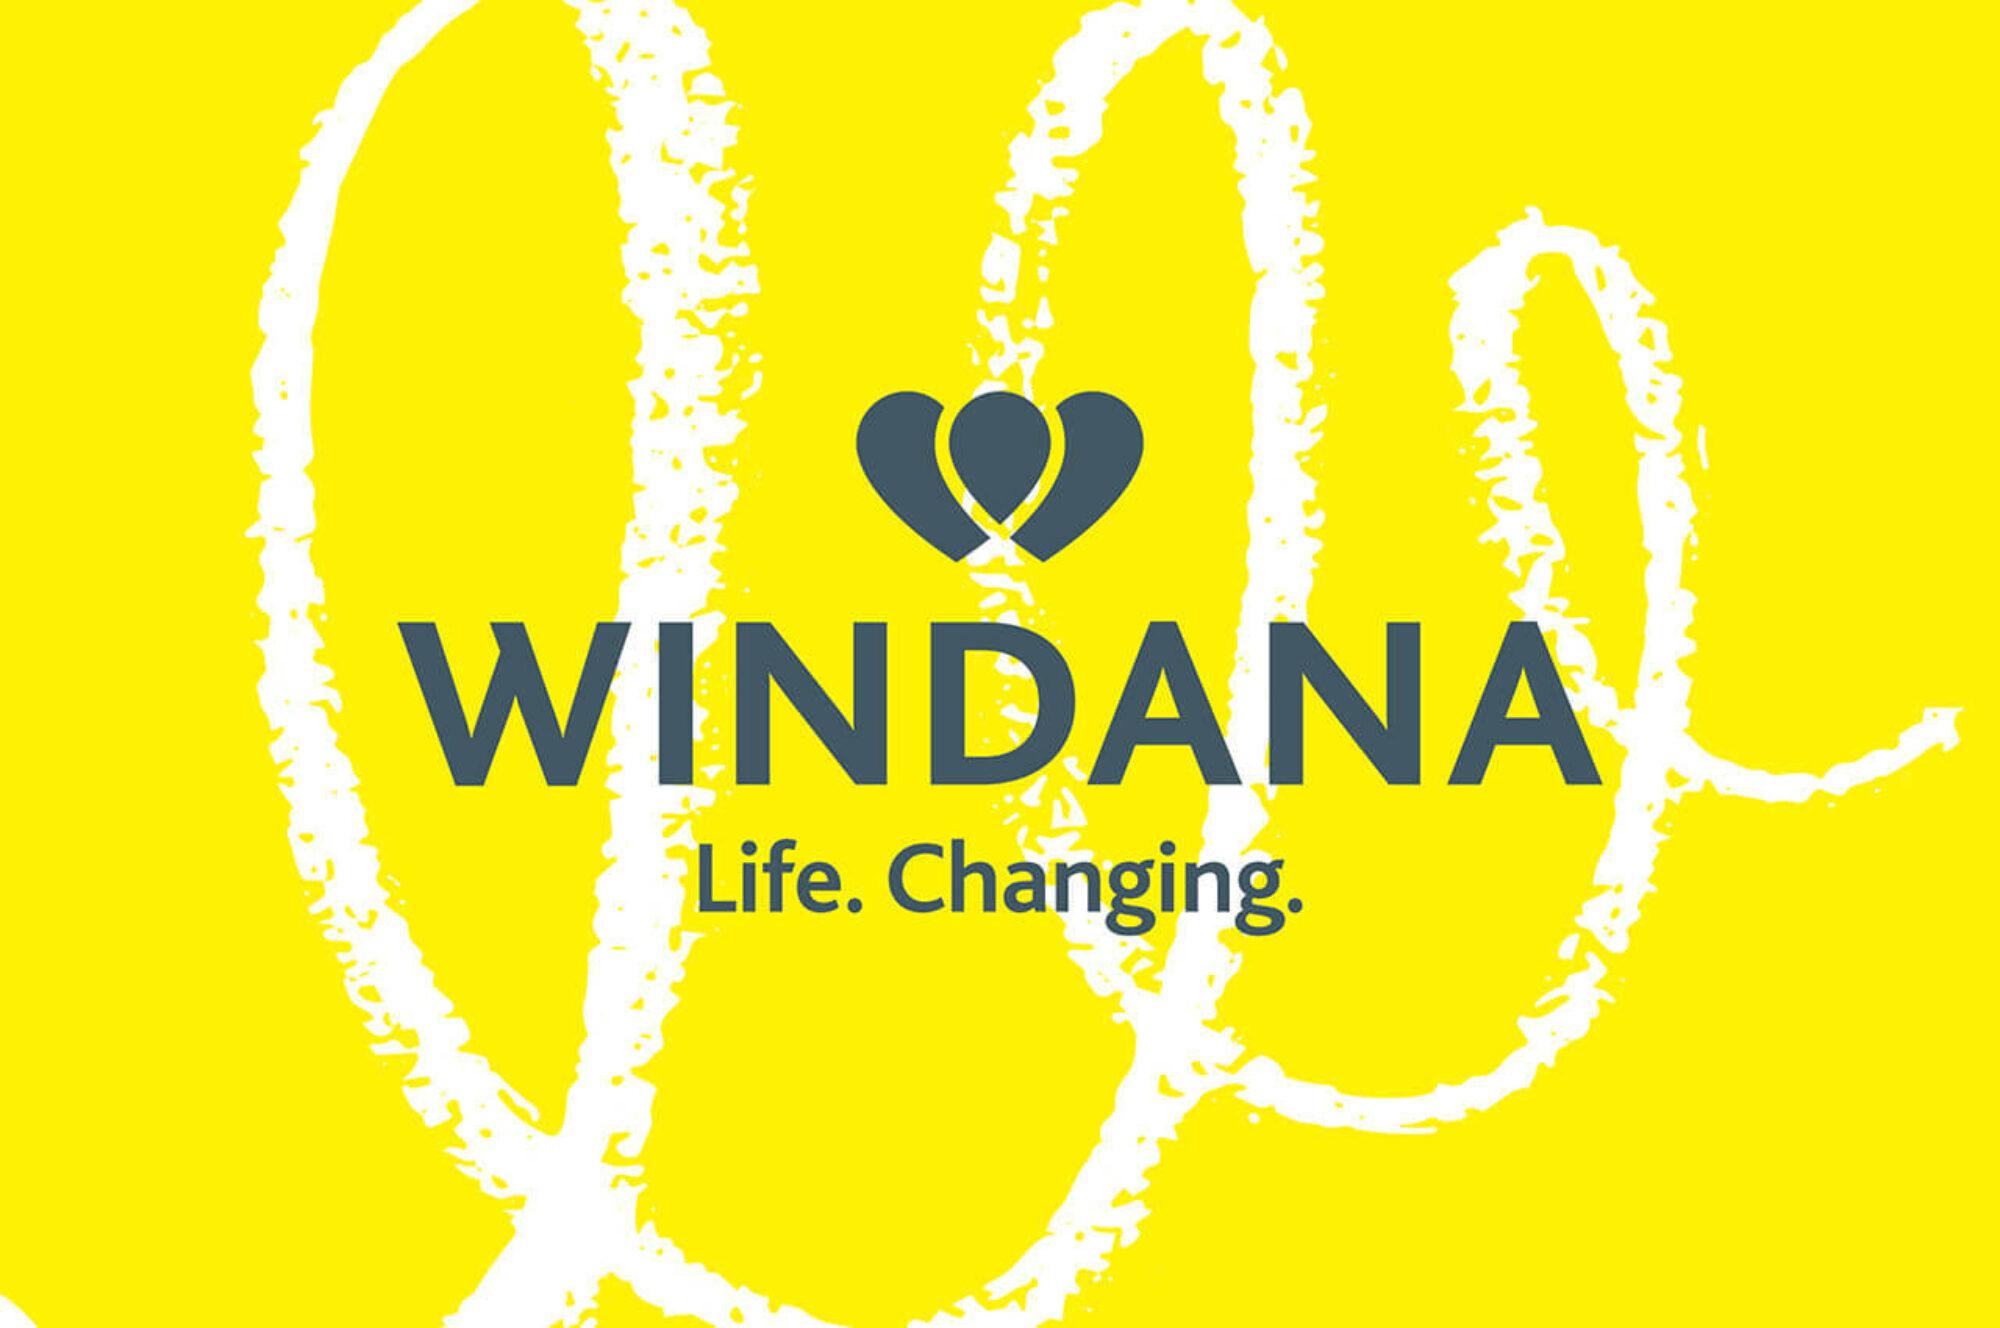 Windana brand identity